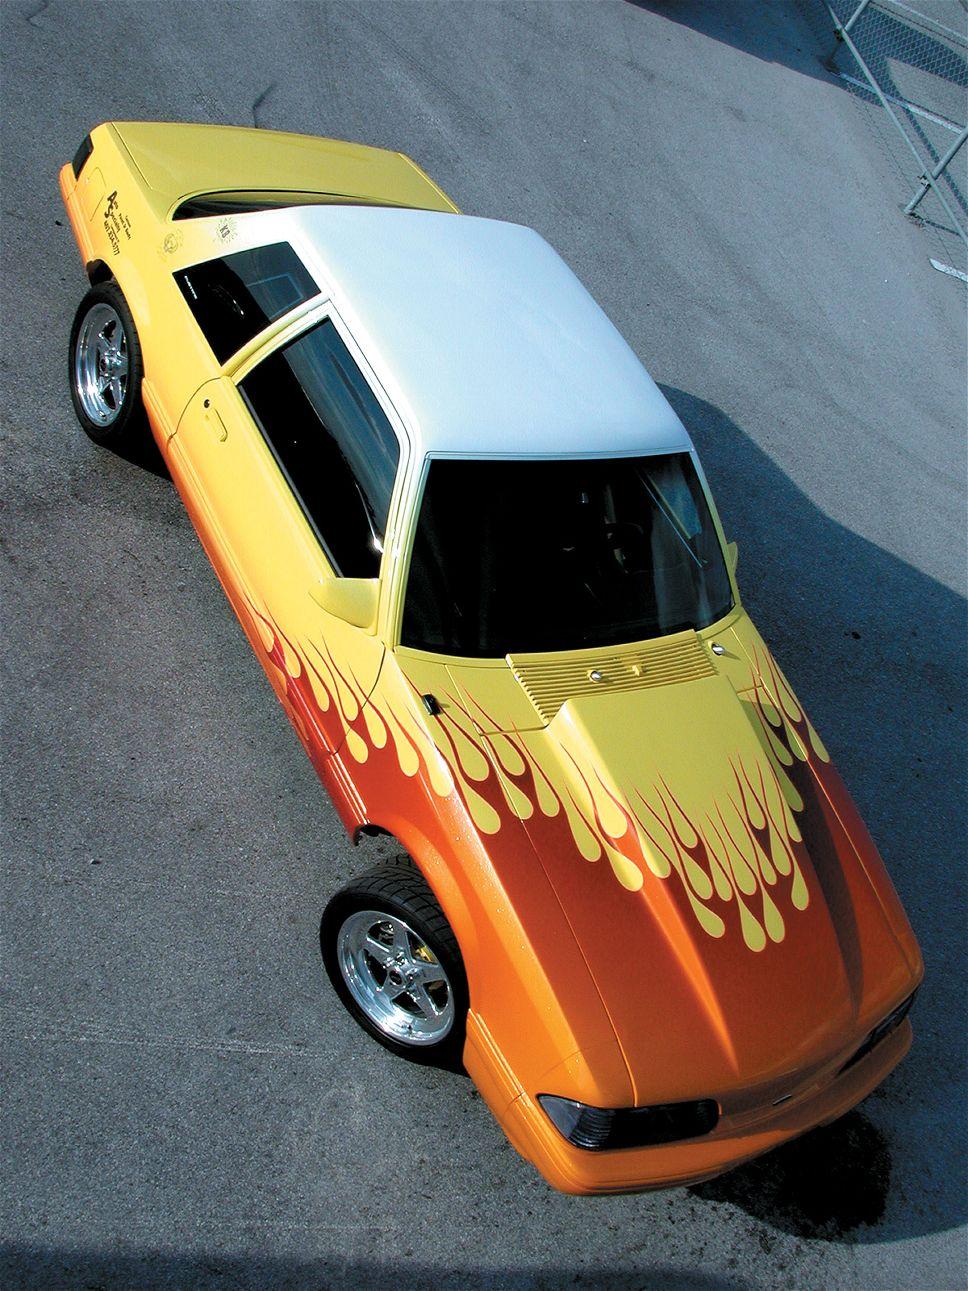 Mustang Paint Jobs : mustang, paint, Flames, Original, Flame, Stencil, Paint